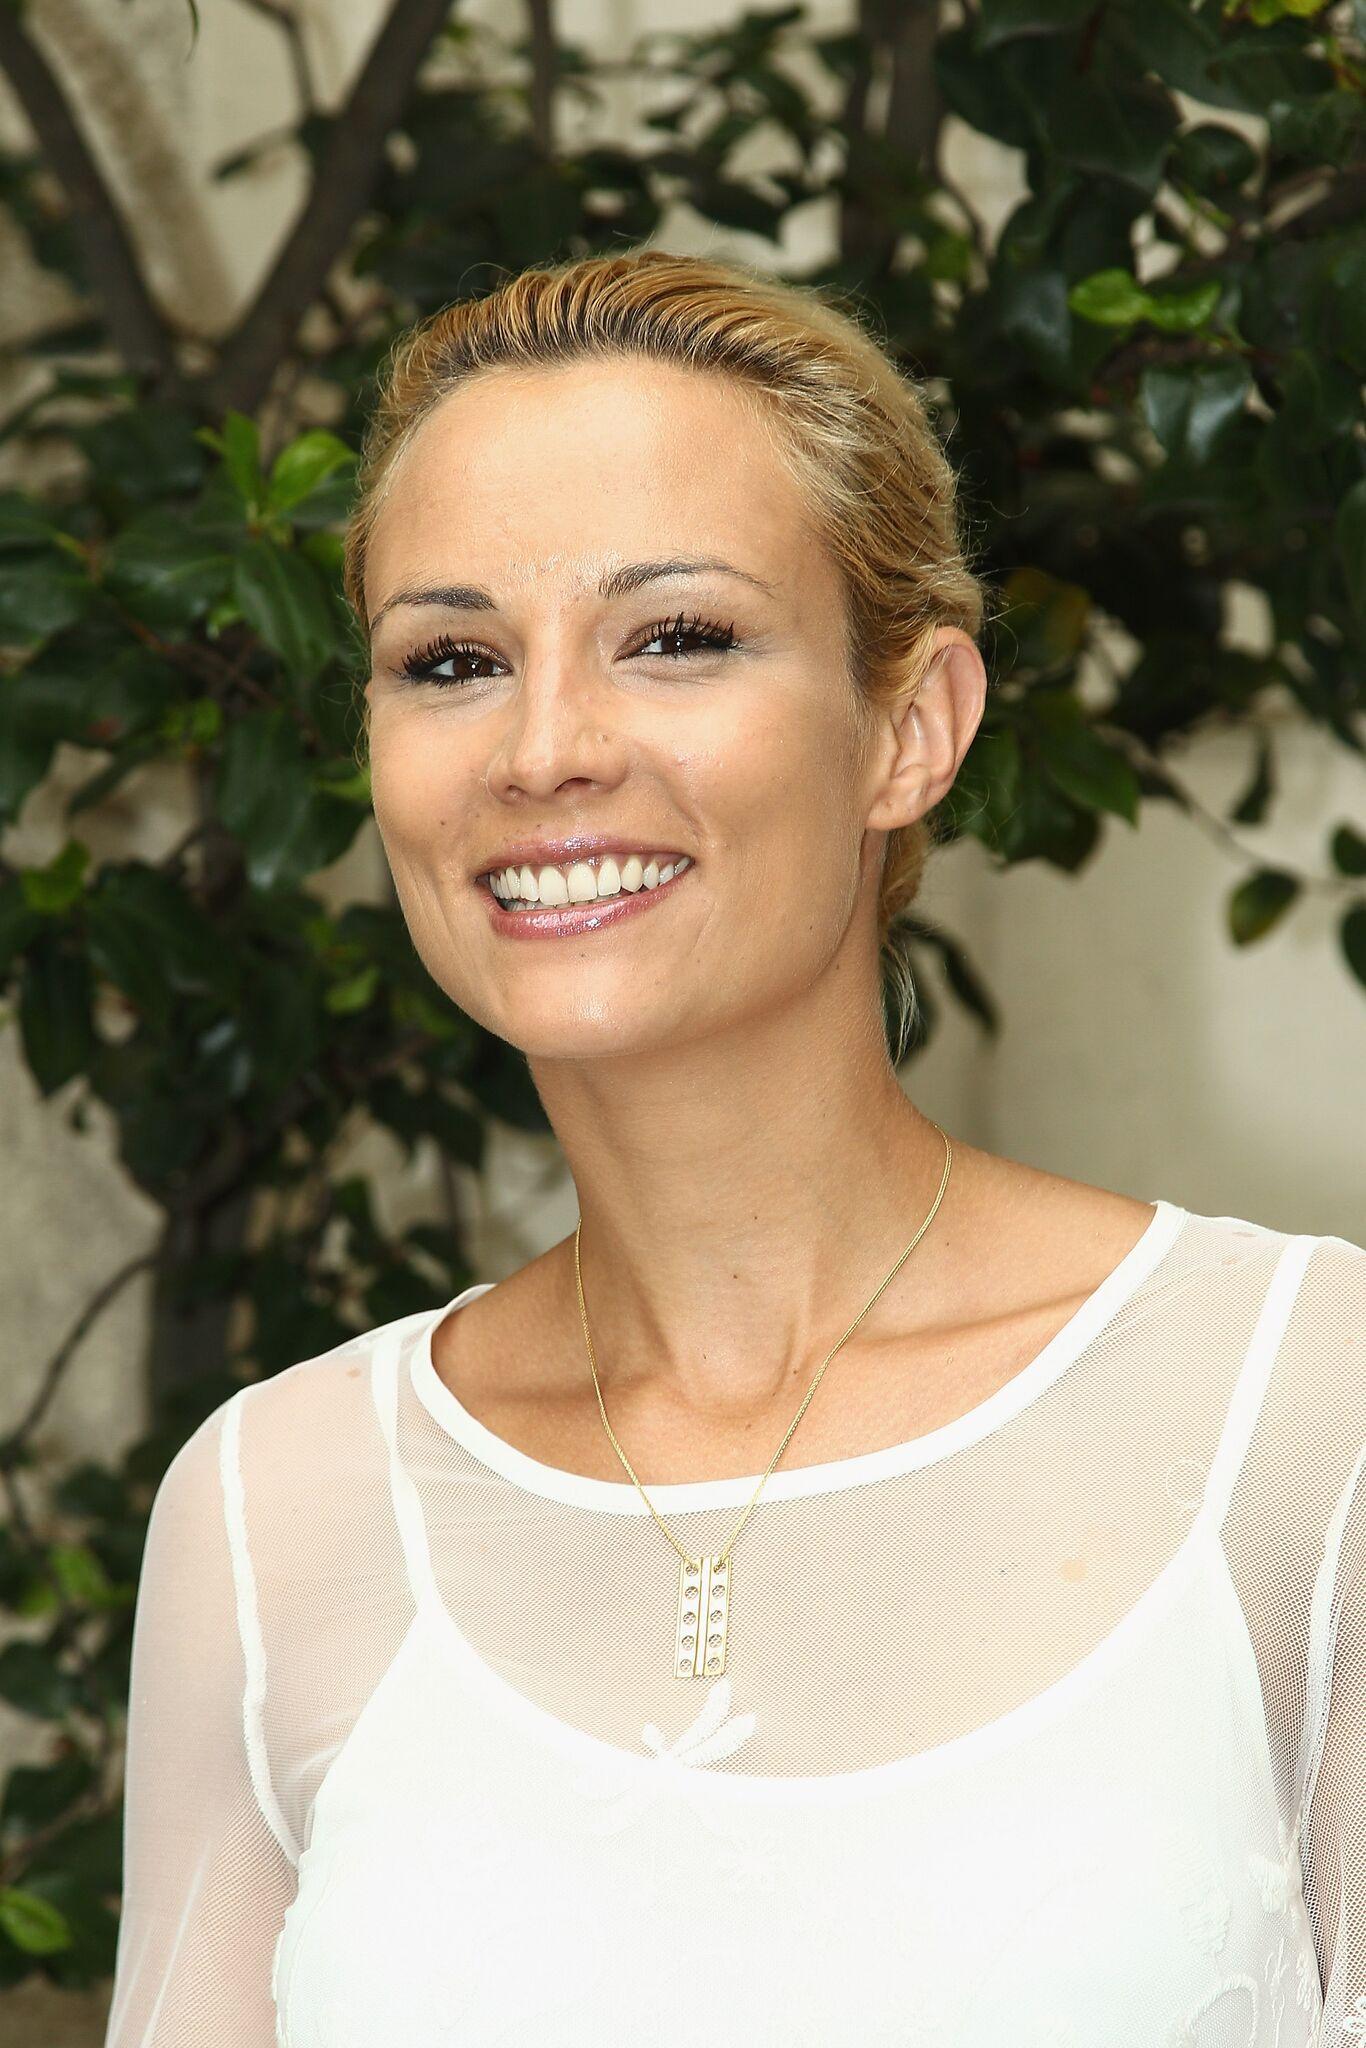 L'ancienne Miss France Élodie Gossuin. l Source : Getty Images